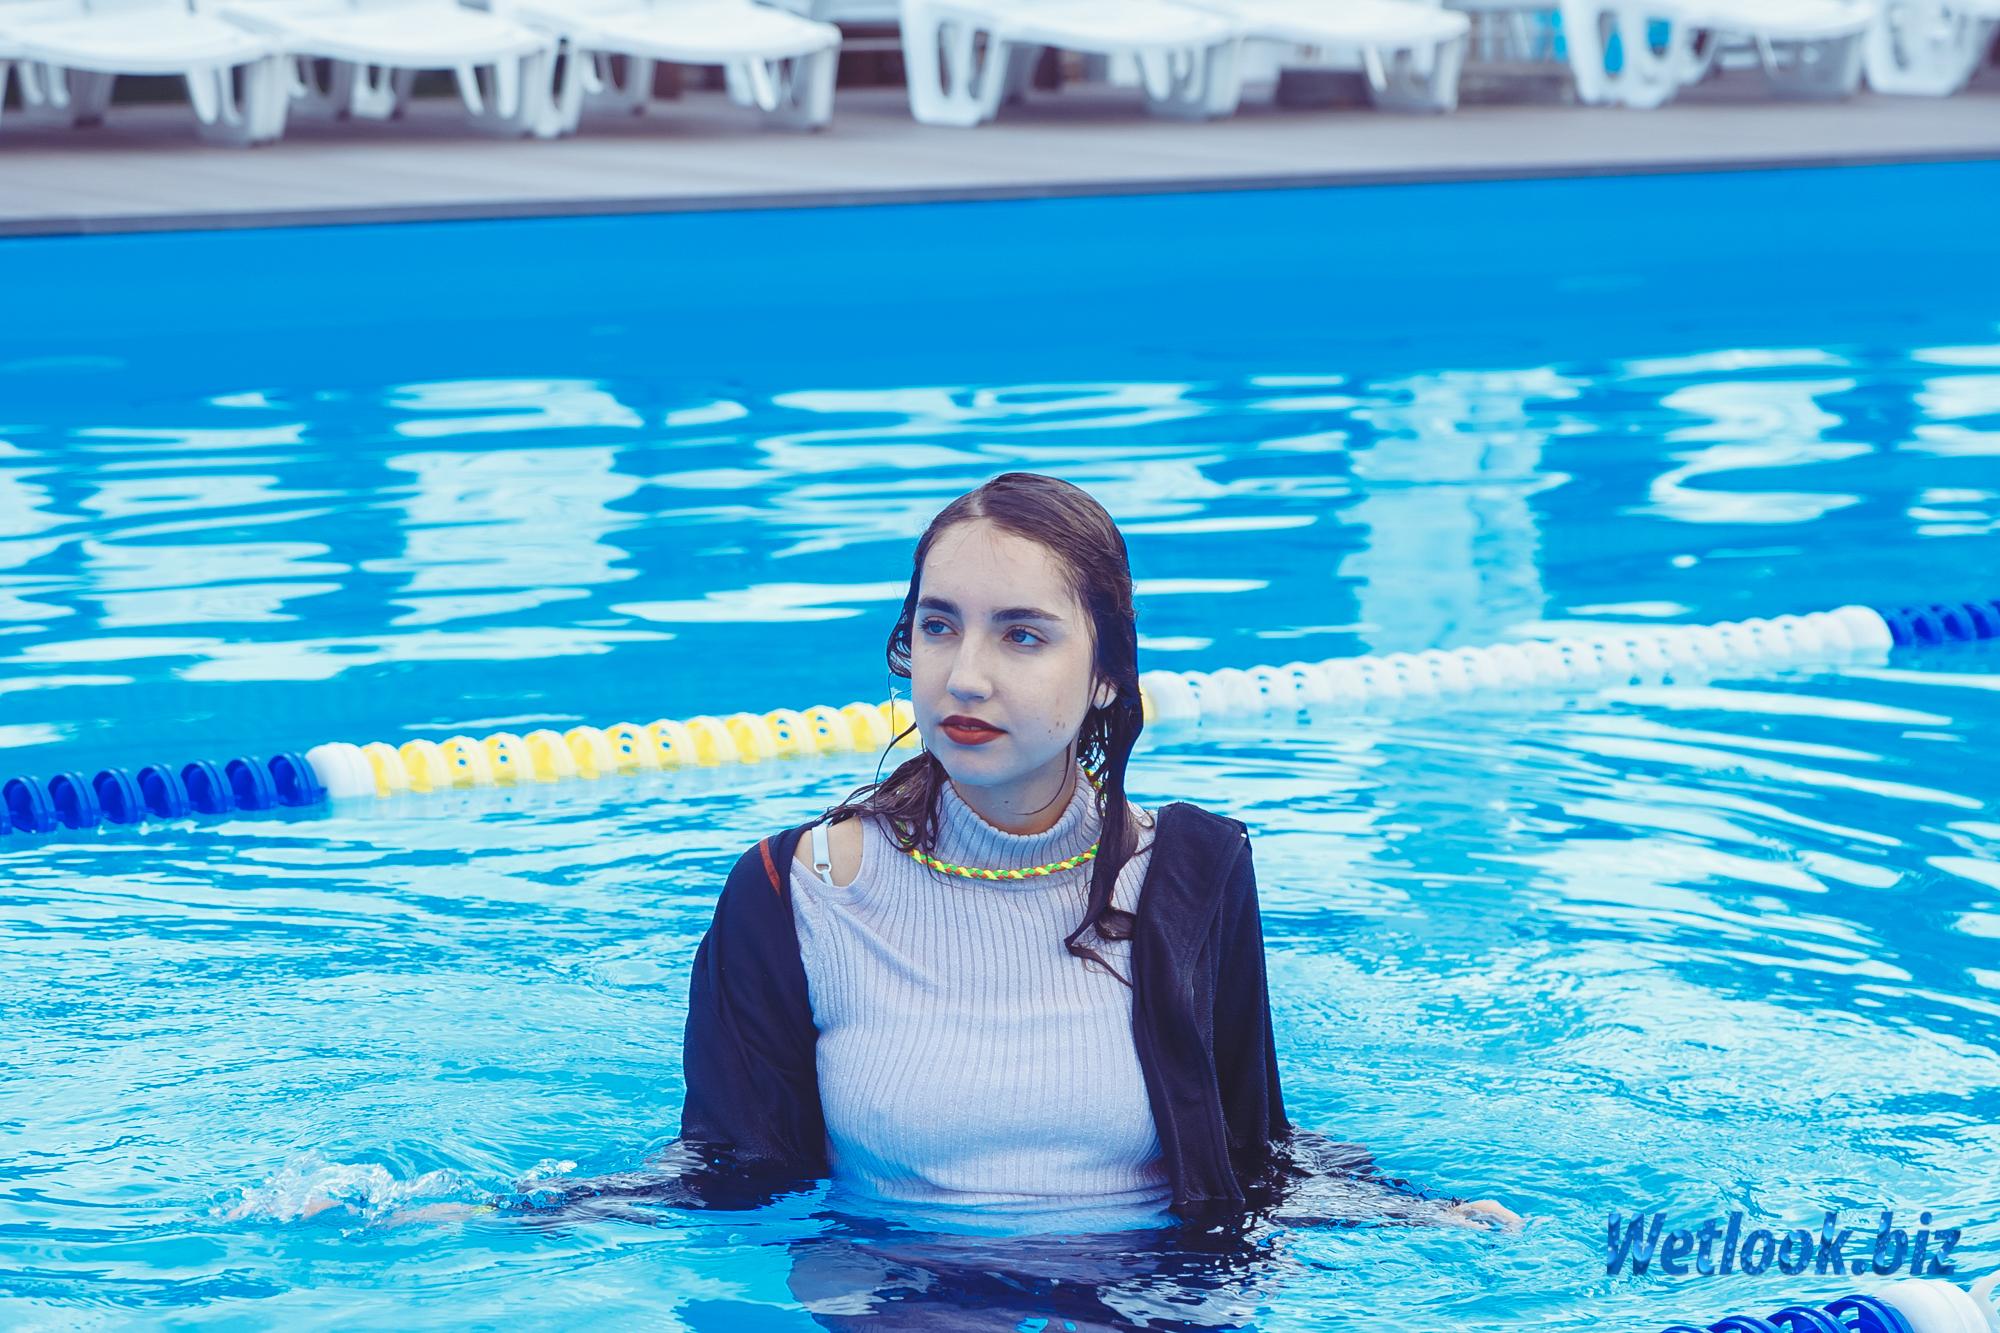 Wetlook girl Emmy Set 6 in Pool Photo and Video - WetLook.Biz